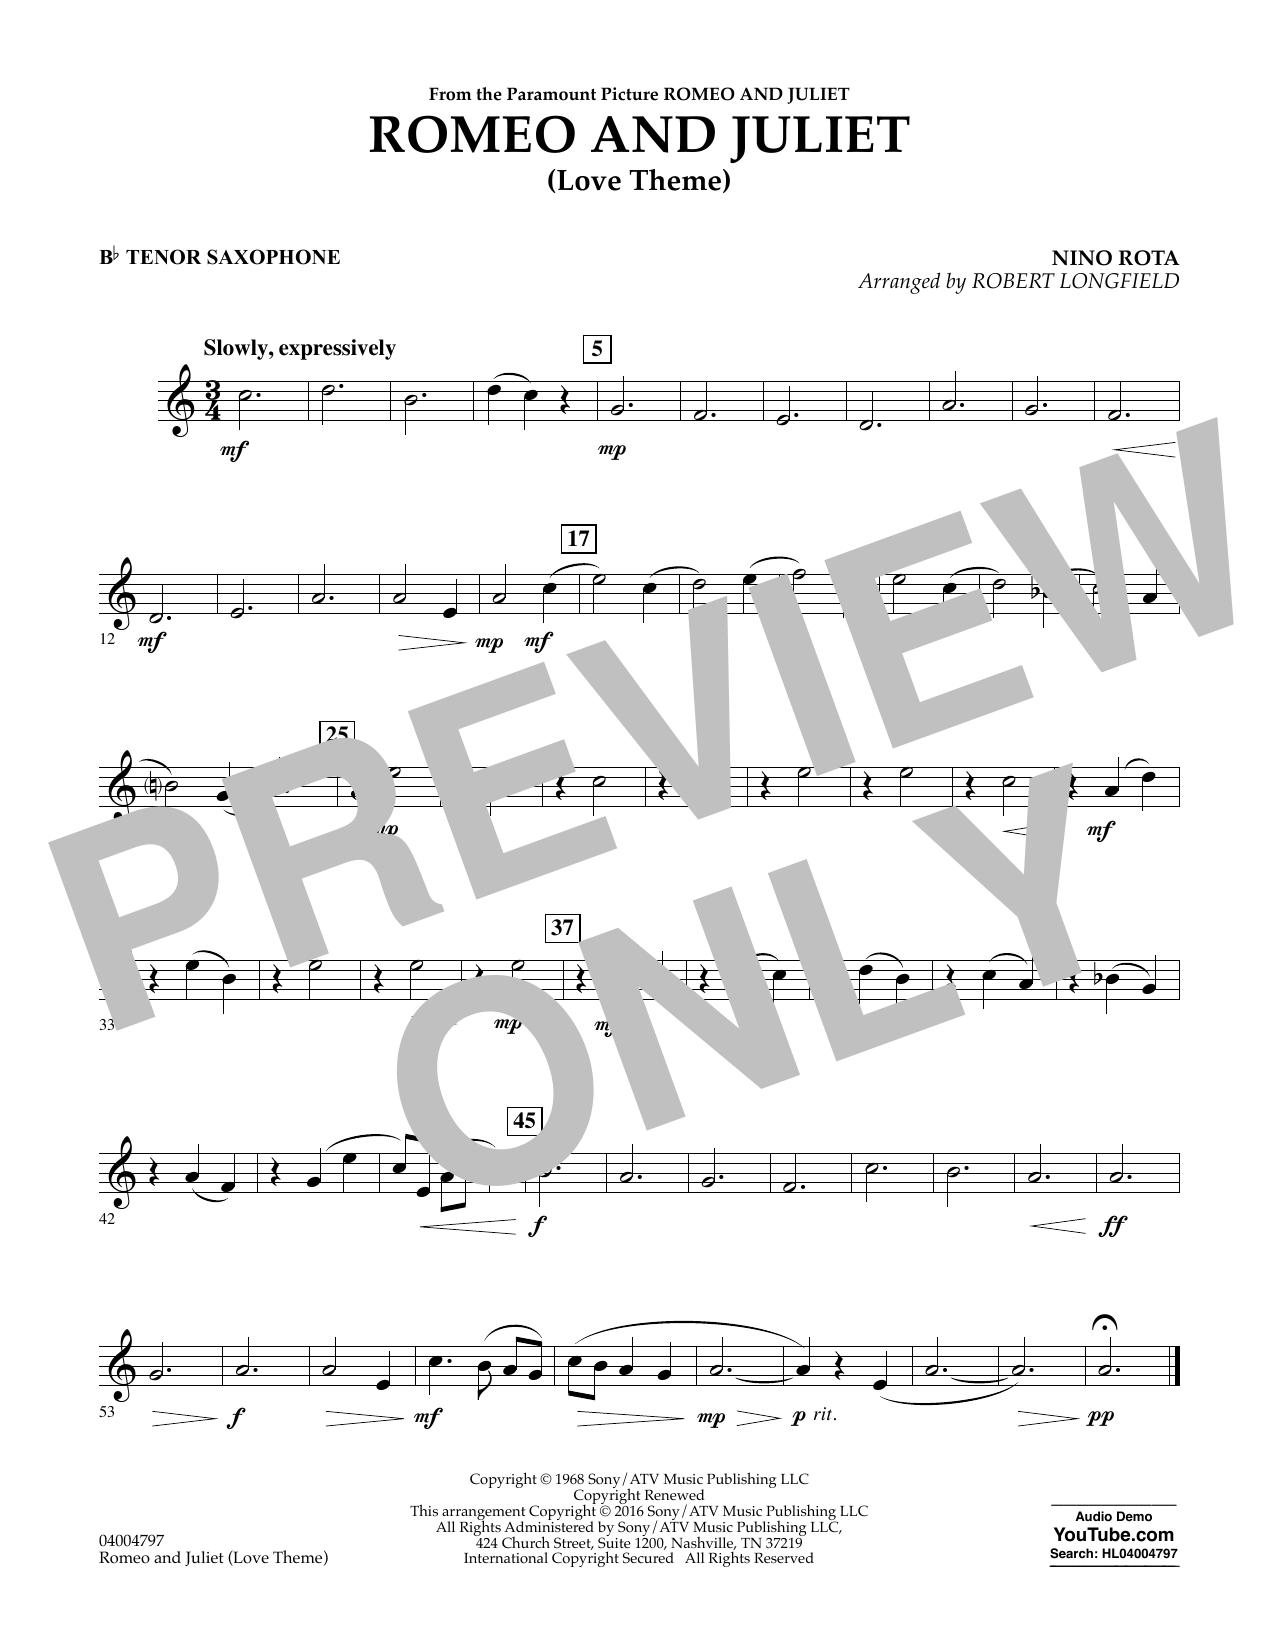 Romeo and Juliet (Love Theme) - Bb Tenor Saxophone (Concert Band)